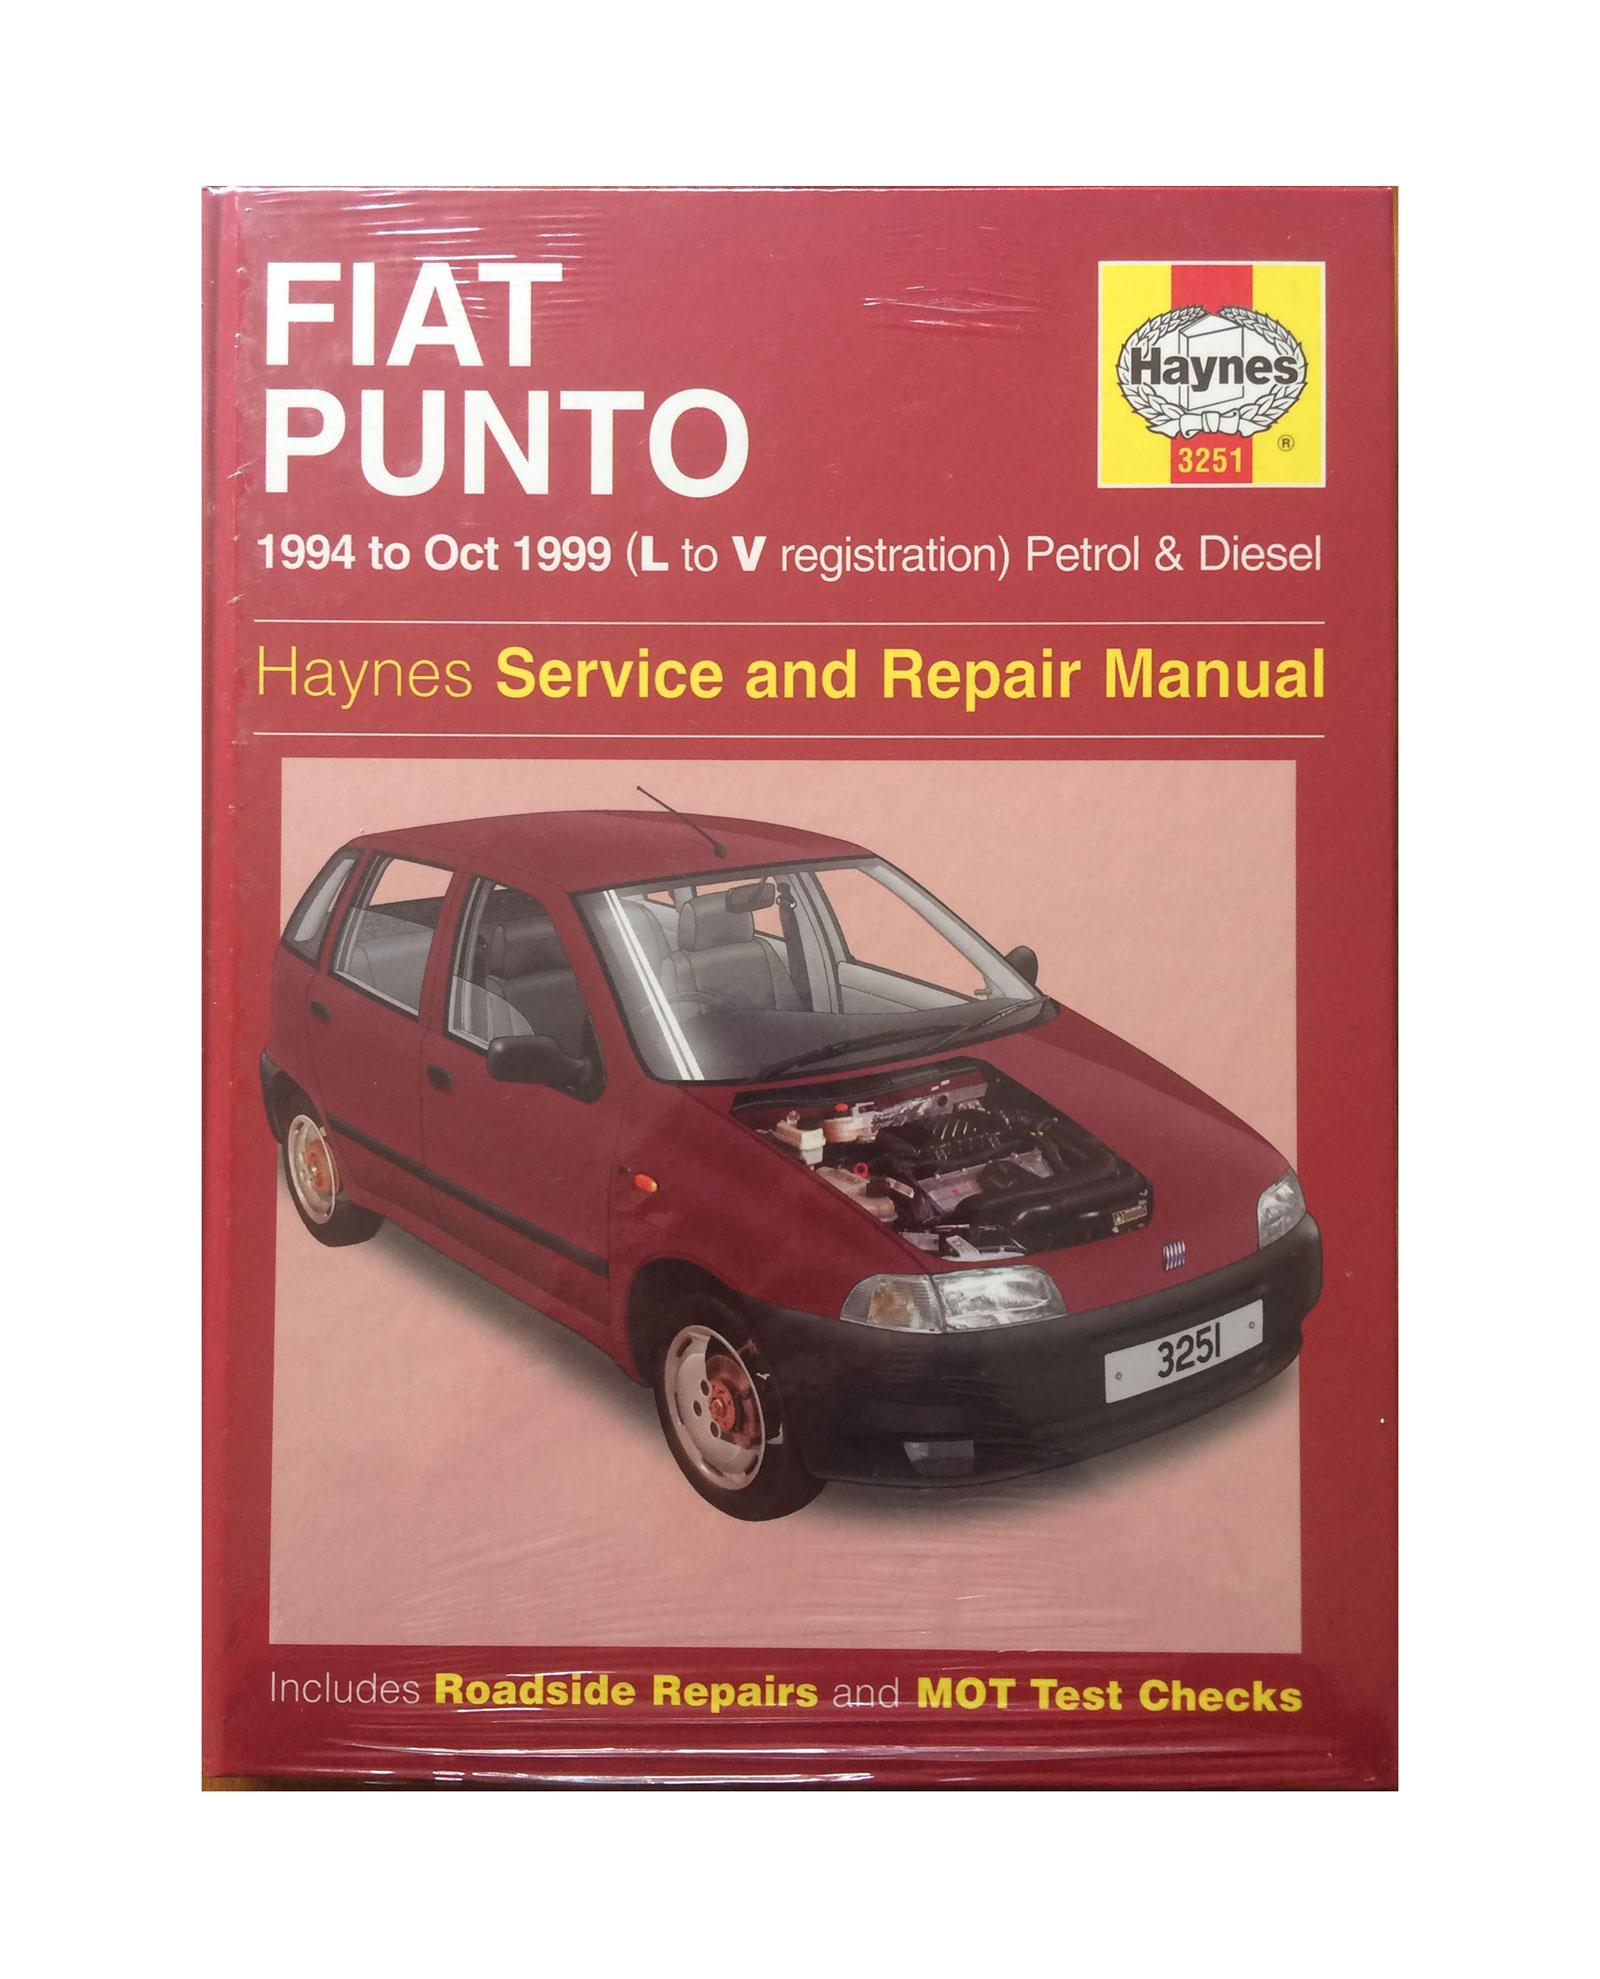 Fiat Punto L-V reg Petrol & Diesel - Haynes Service & Repair Manual